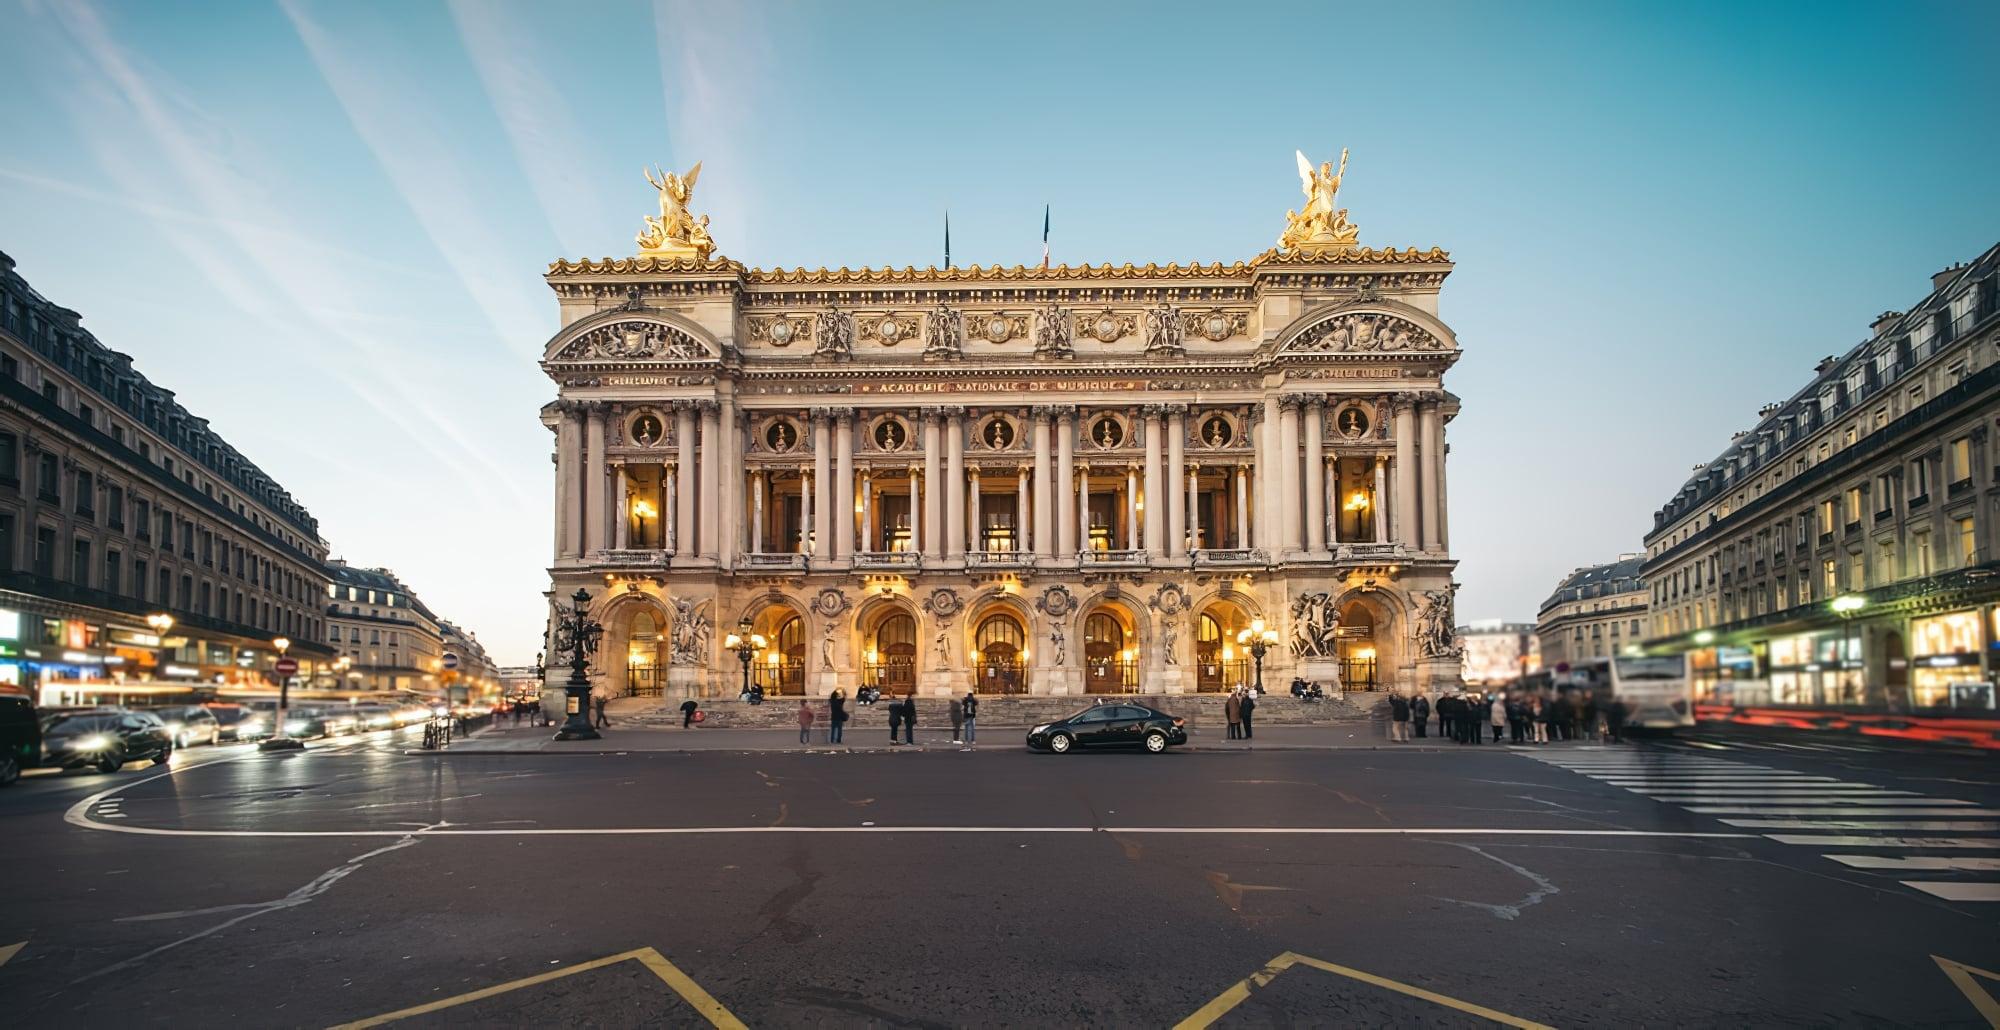 Visiter l'Opéra Garnier à Paris